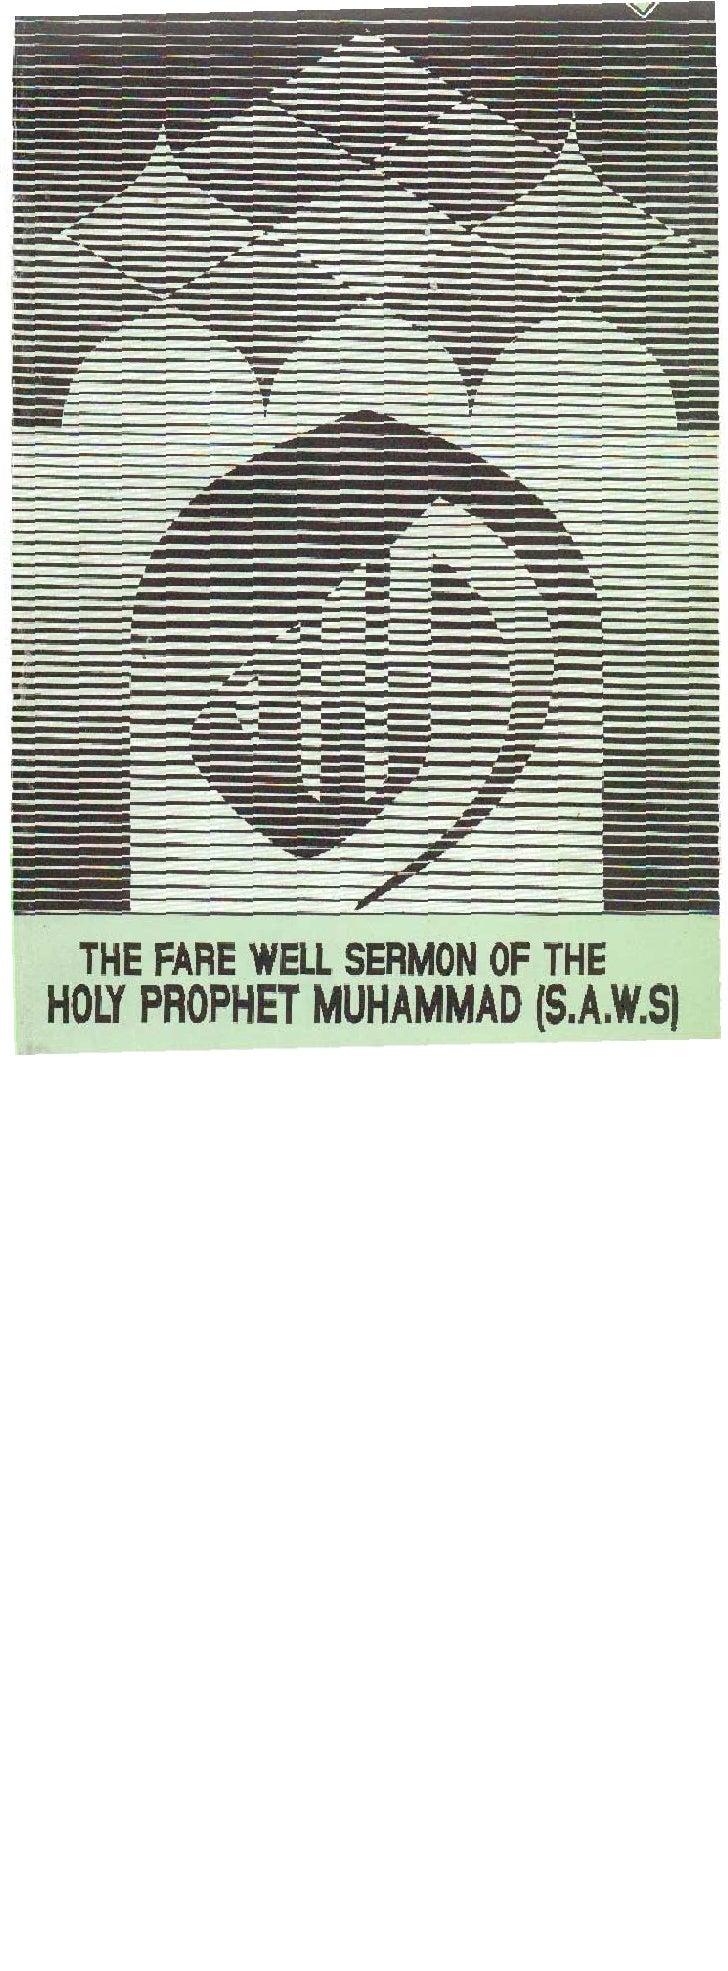 Farewell sermon of_Prophet_Muhammad_saw